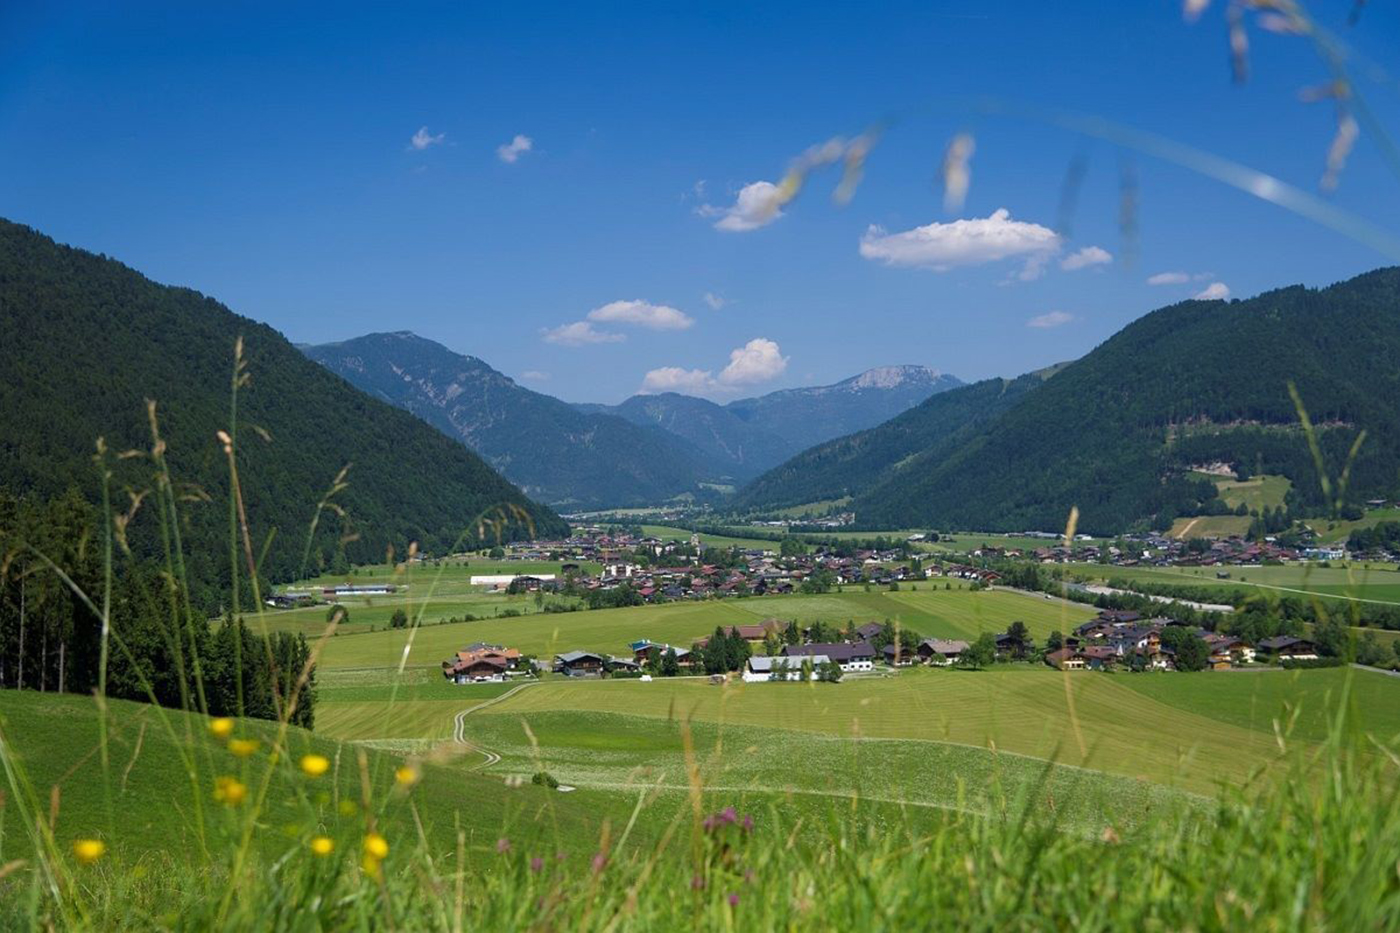 Schneewinkel Tirol - St. Johanner Bergbahnen